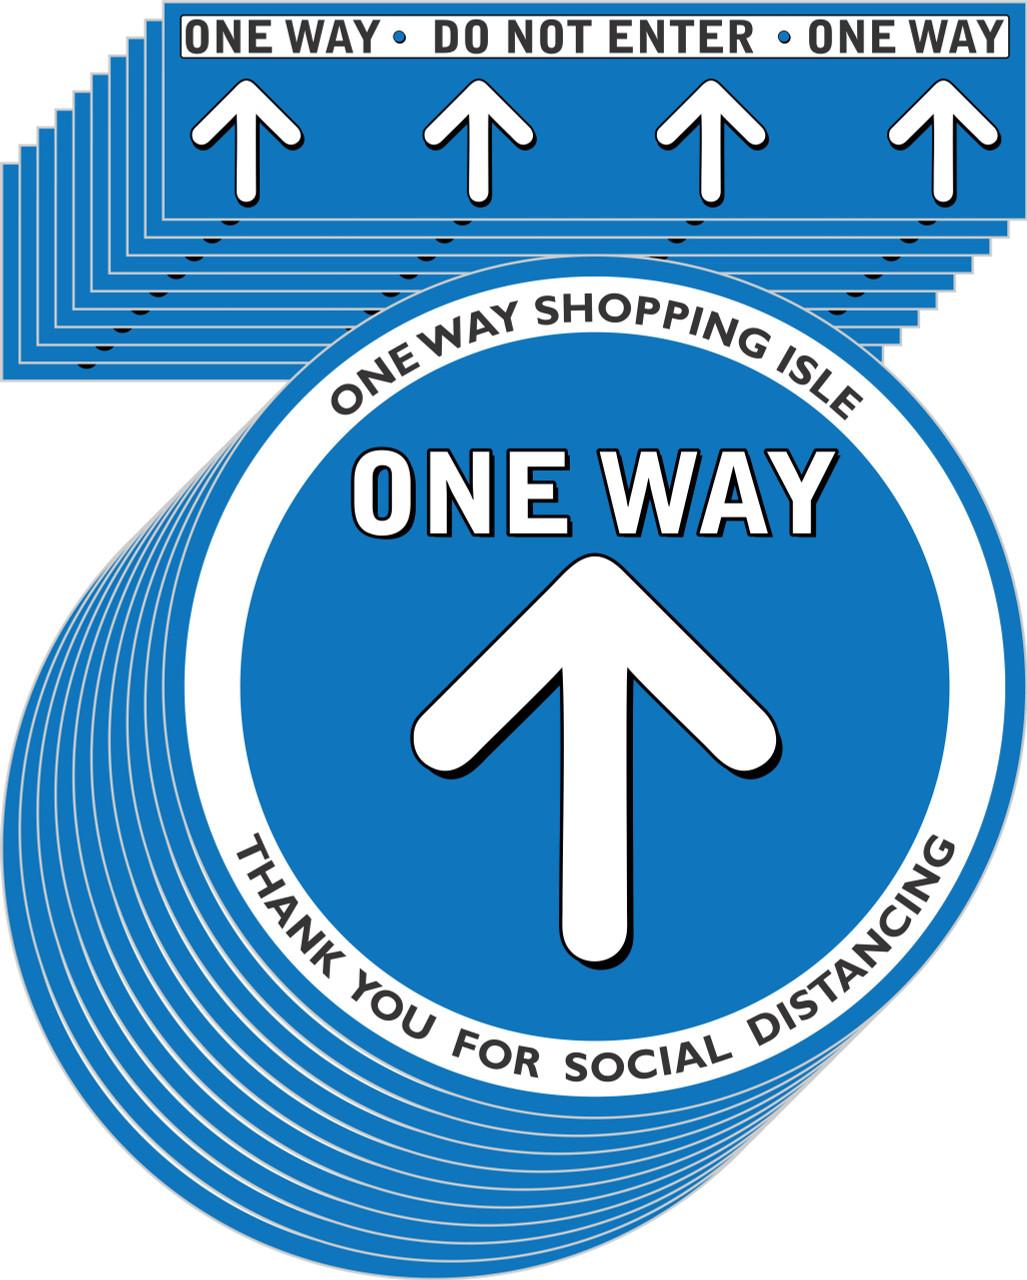 One way Aisle Social Distancing Floor Decal | Covid-19 Floor Sticker | Coronavirus Floor Decal | Social Distancing Floor Sign | Pandemic Floor Sticker | Do Not Enter Floor Sticker 10 pack